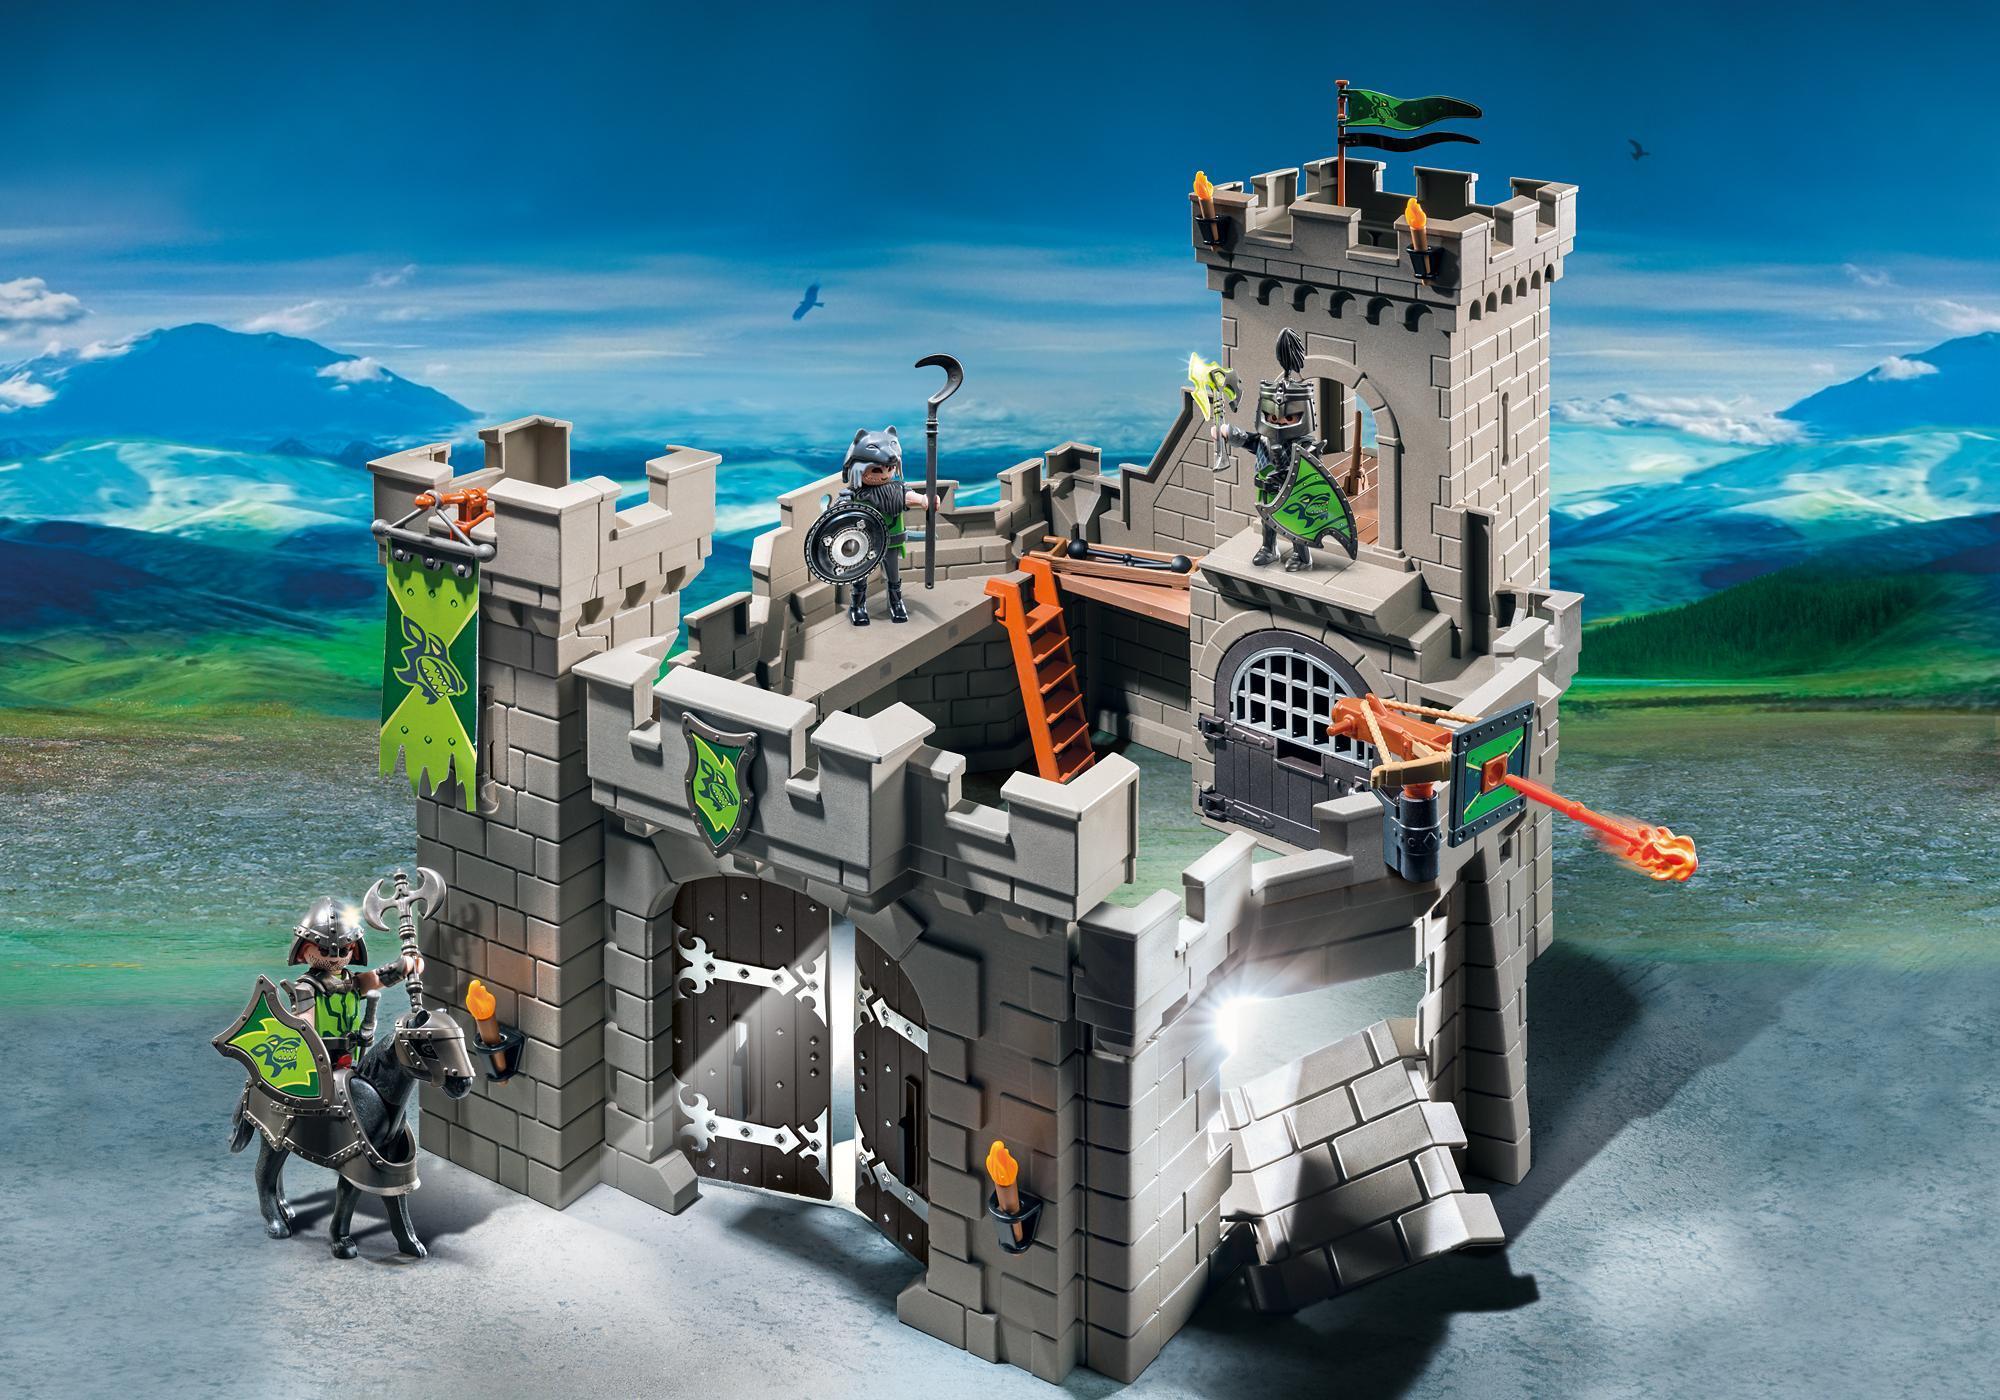 http://media.playmobil.com/i/playmobil/6002_product_detail